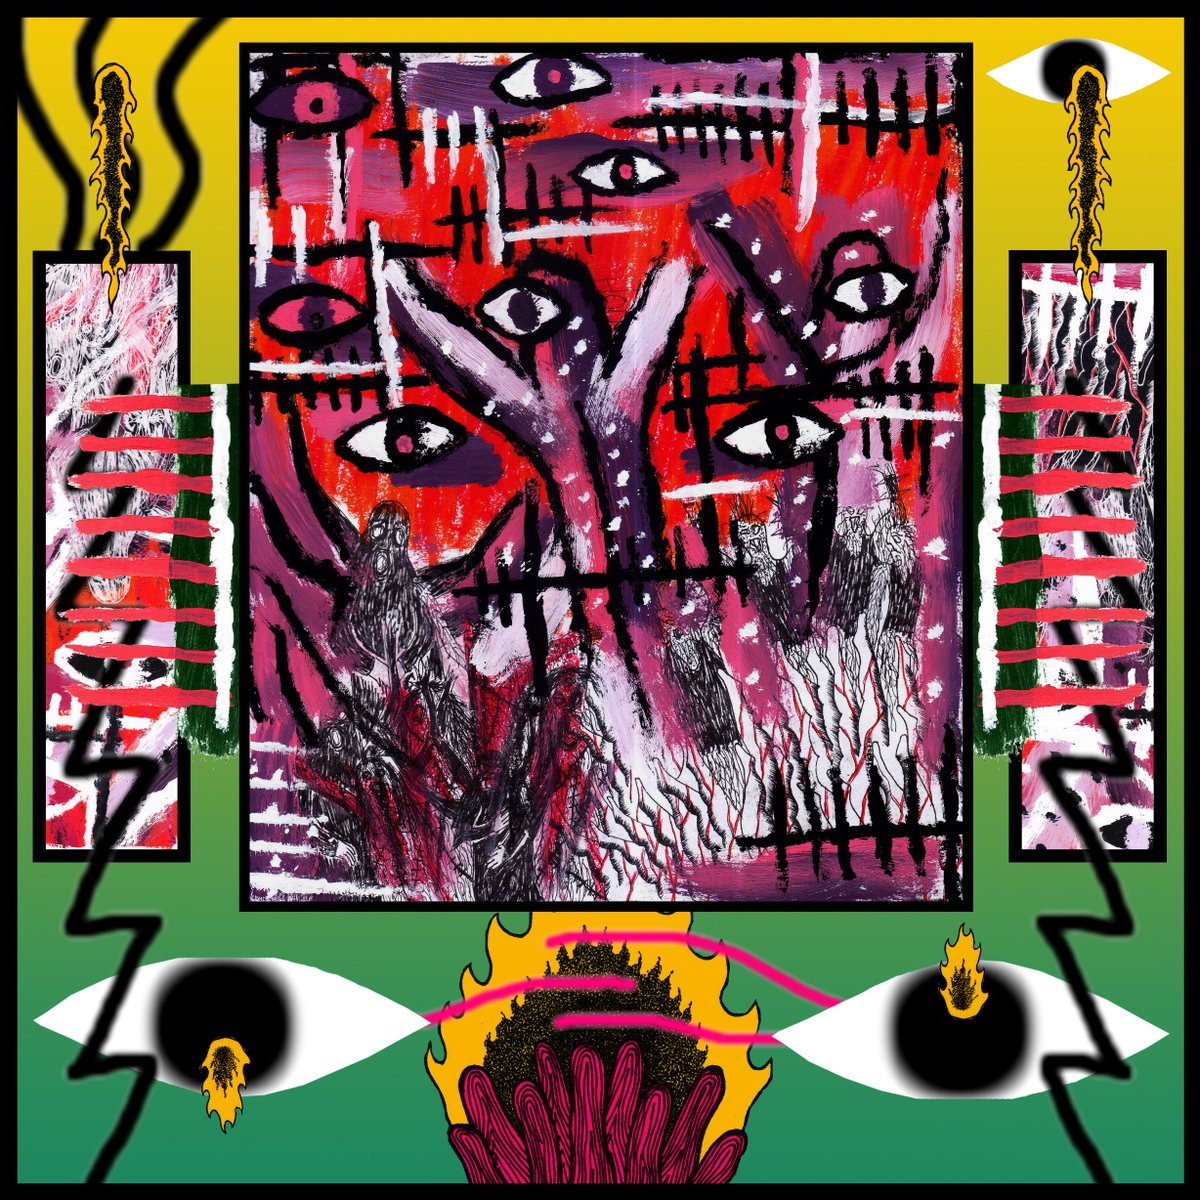 &quot; Fanatics And Lost &quot;   http:// pemakanbangkai.blogspot.co.id/2017/08/fanati cs-and-lost-digital-retouch.html &nbsp; …   #art #graphicdesign #vinlydesign #alhamdulillah #contemporary #contemporaryart #seni #colour<br>http://pic.twitter.com/wNjP2j8irC